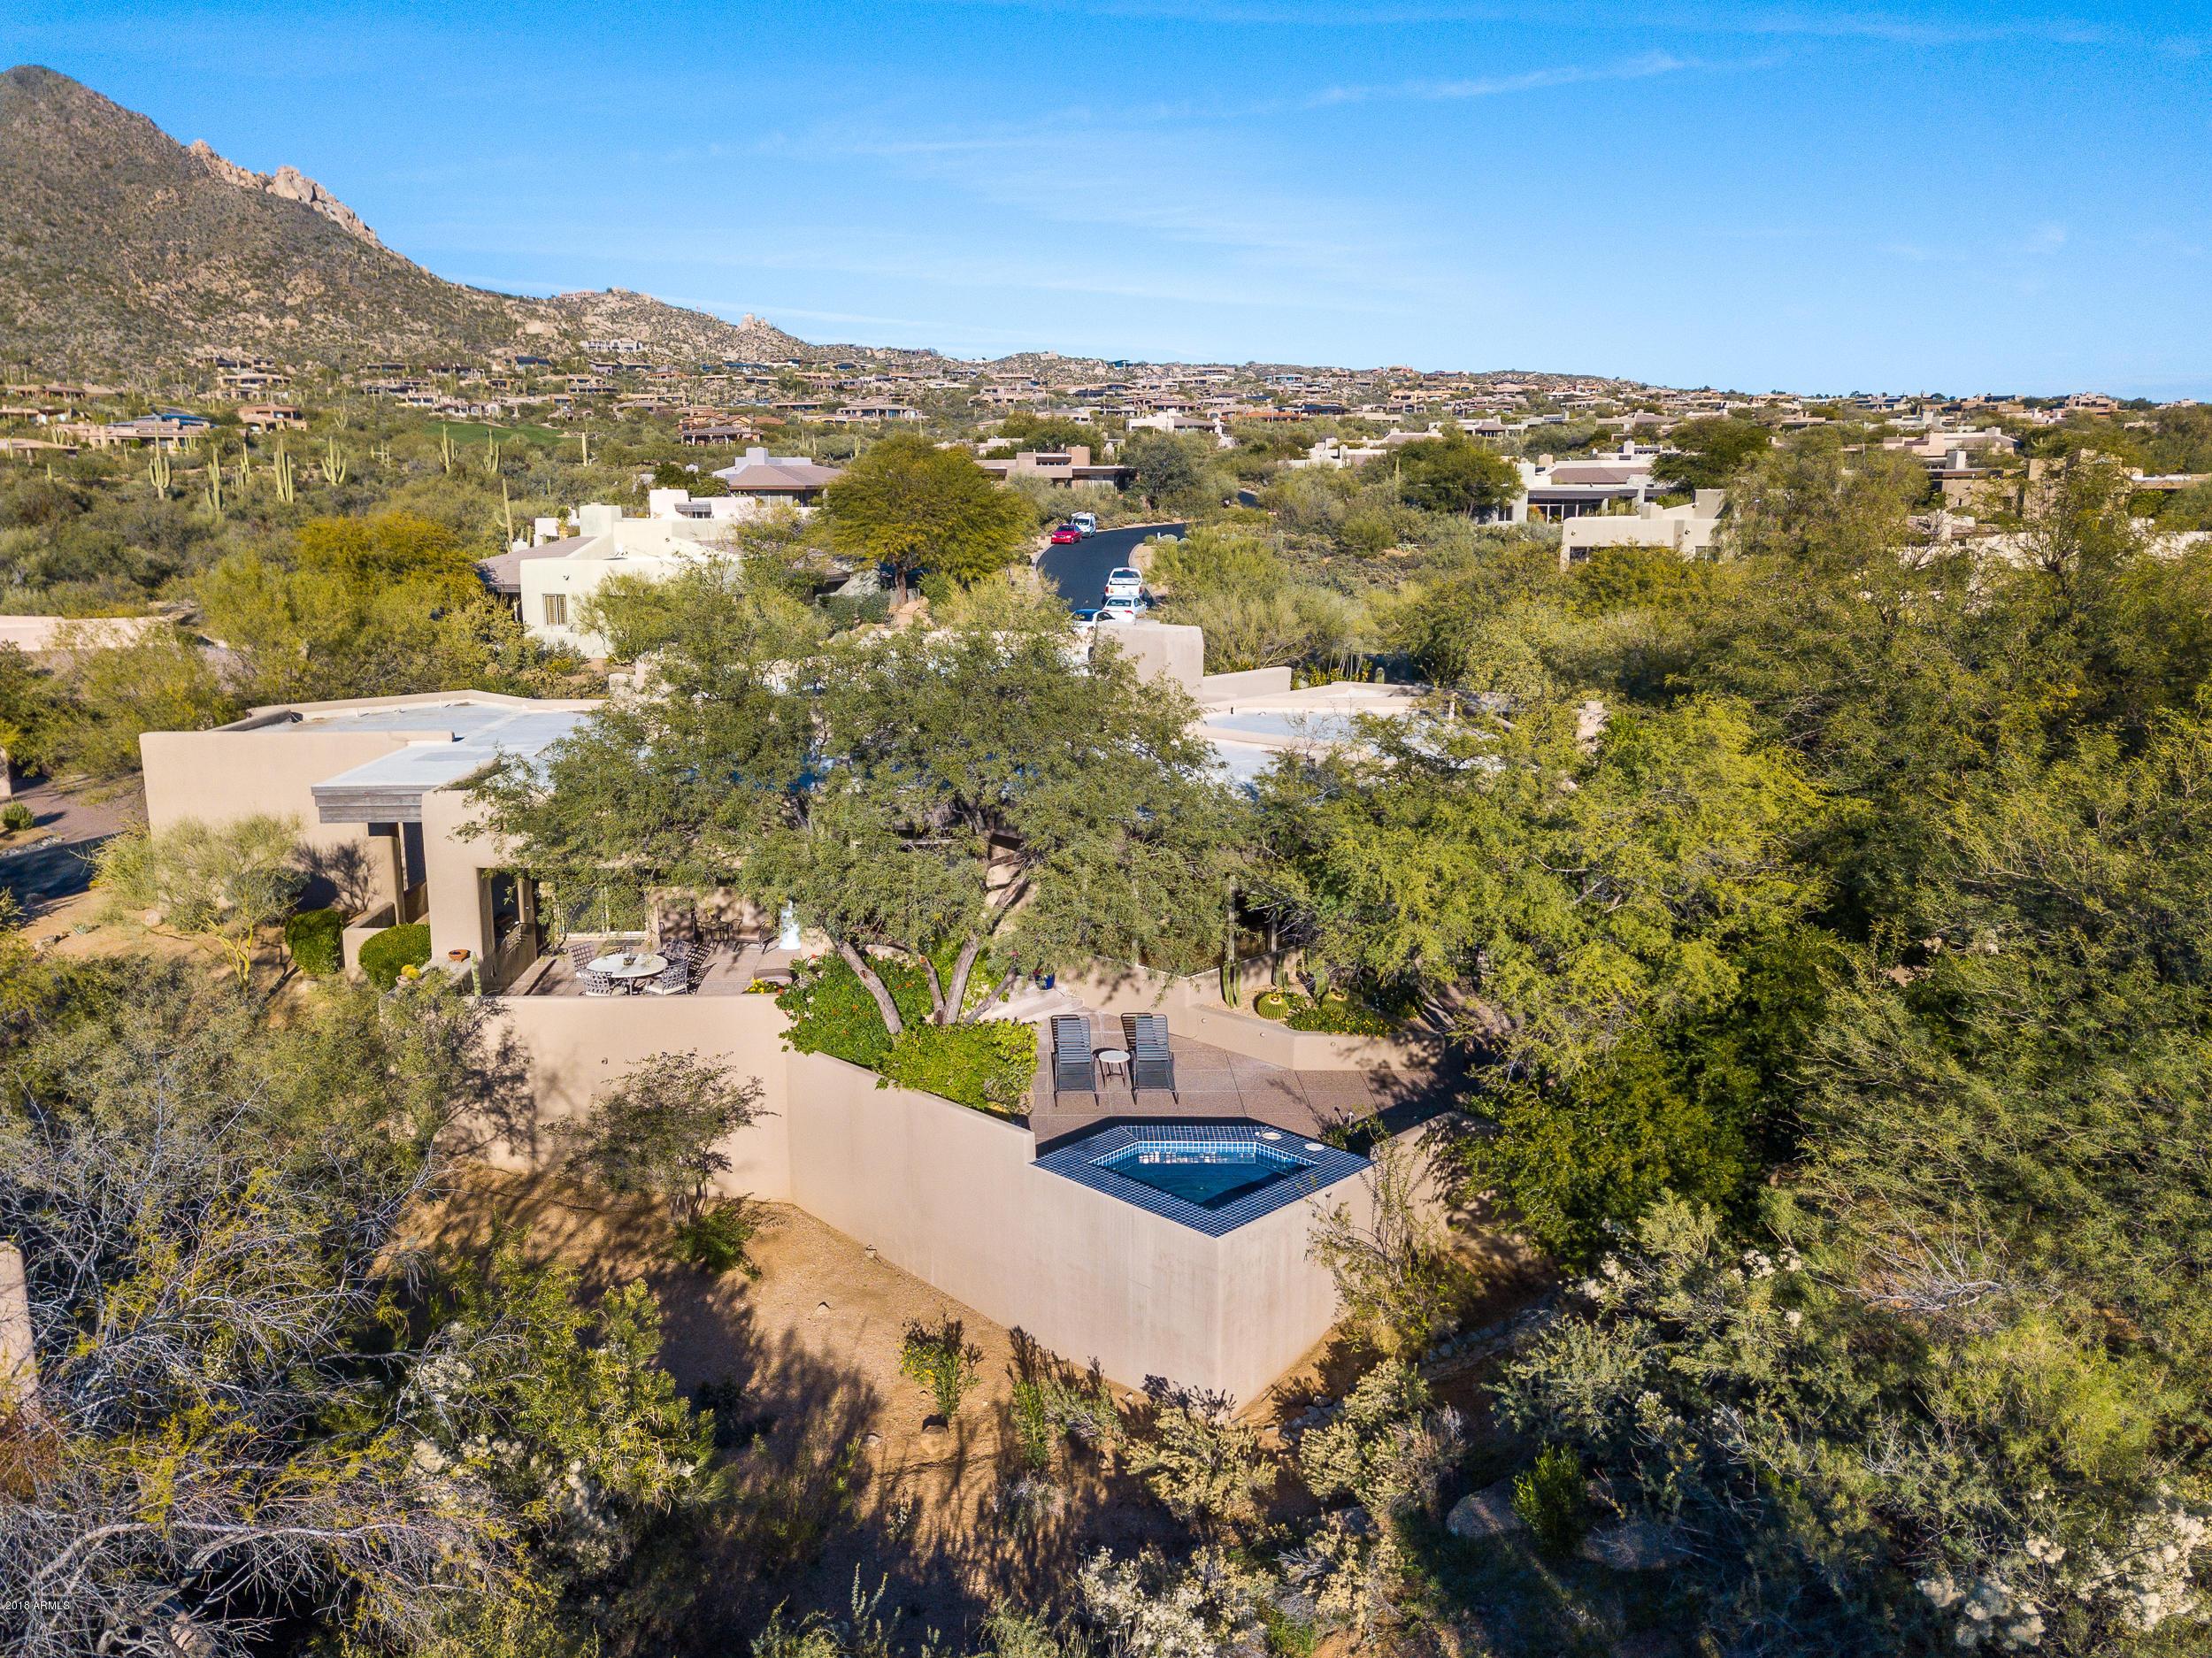 MLS 5856592 10525 E HONEY MESQUITE Drive, Scottsdale, AZ 85262 Scottsdale AZ Desert Mountain